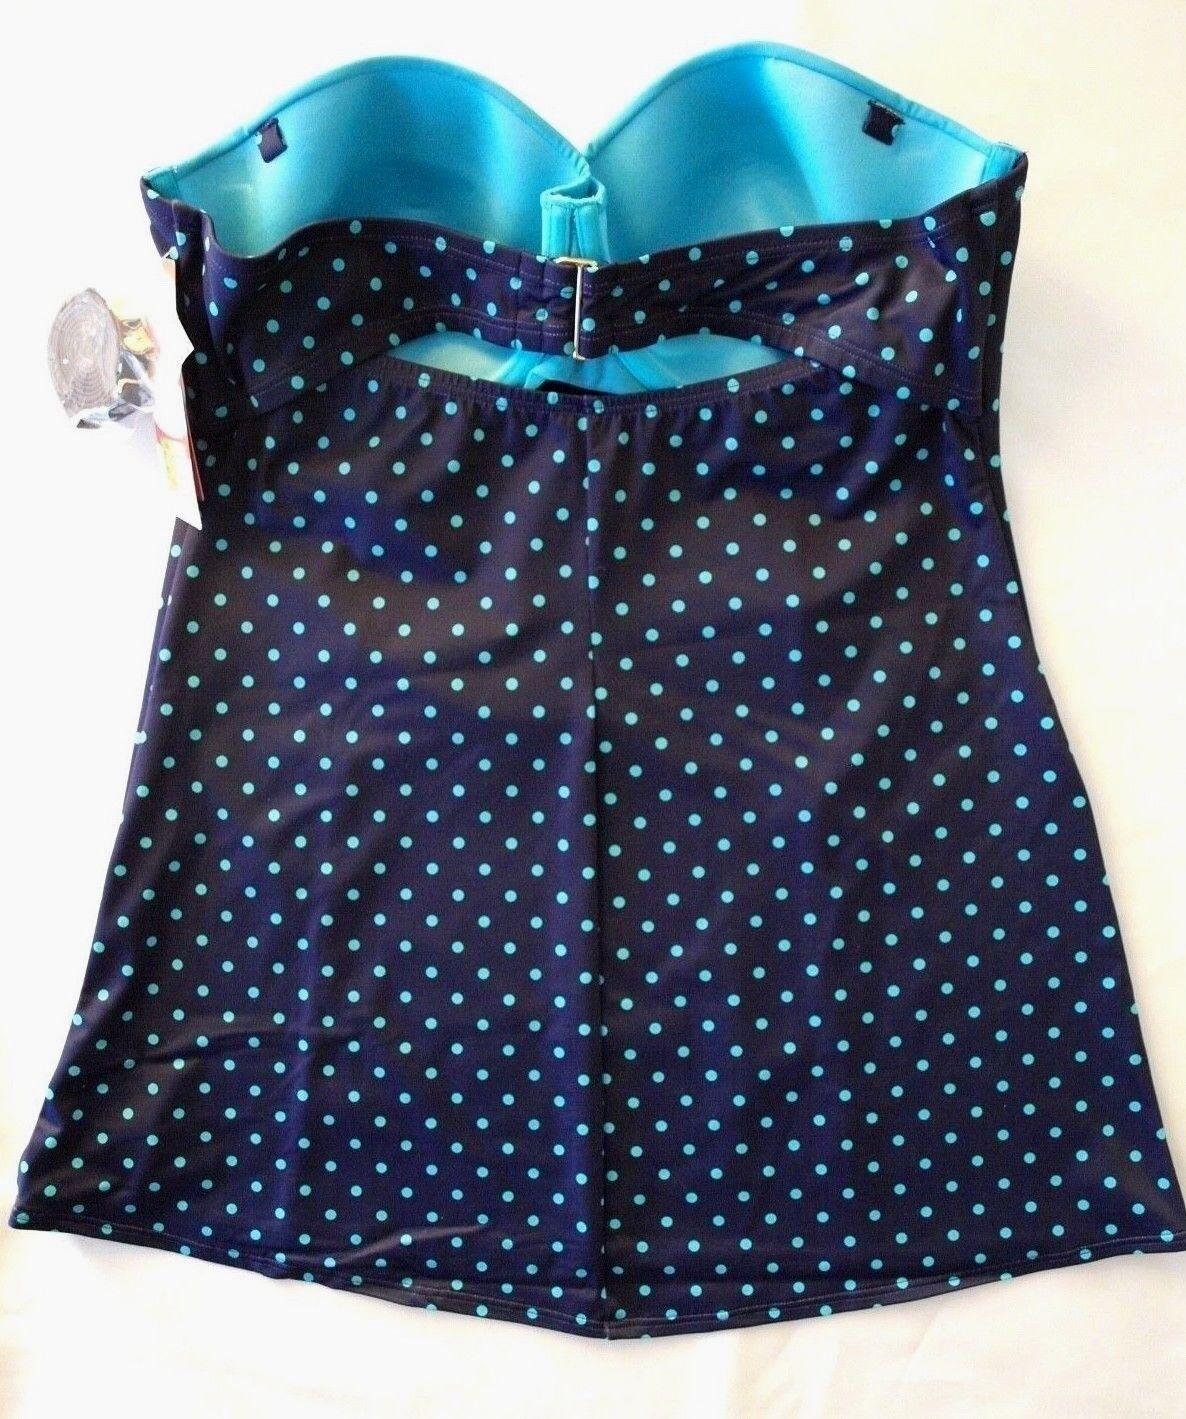 SPANX 2697 Navy Splash Polka Dot Retro Dresskini Top 8,10,12,14,16 New $108